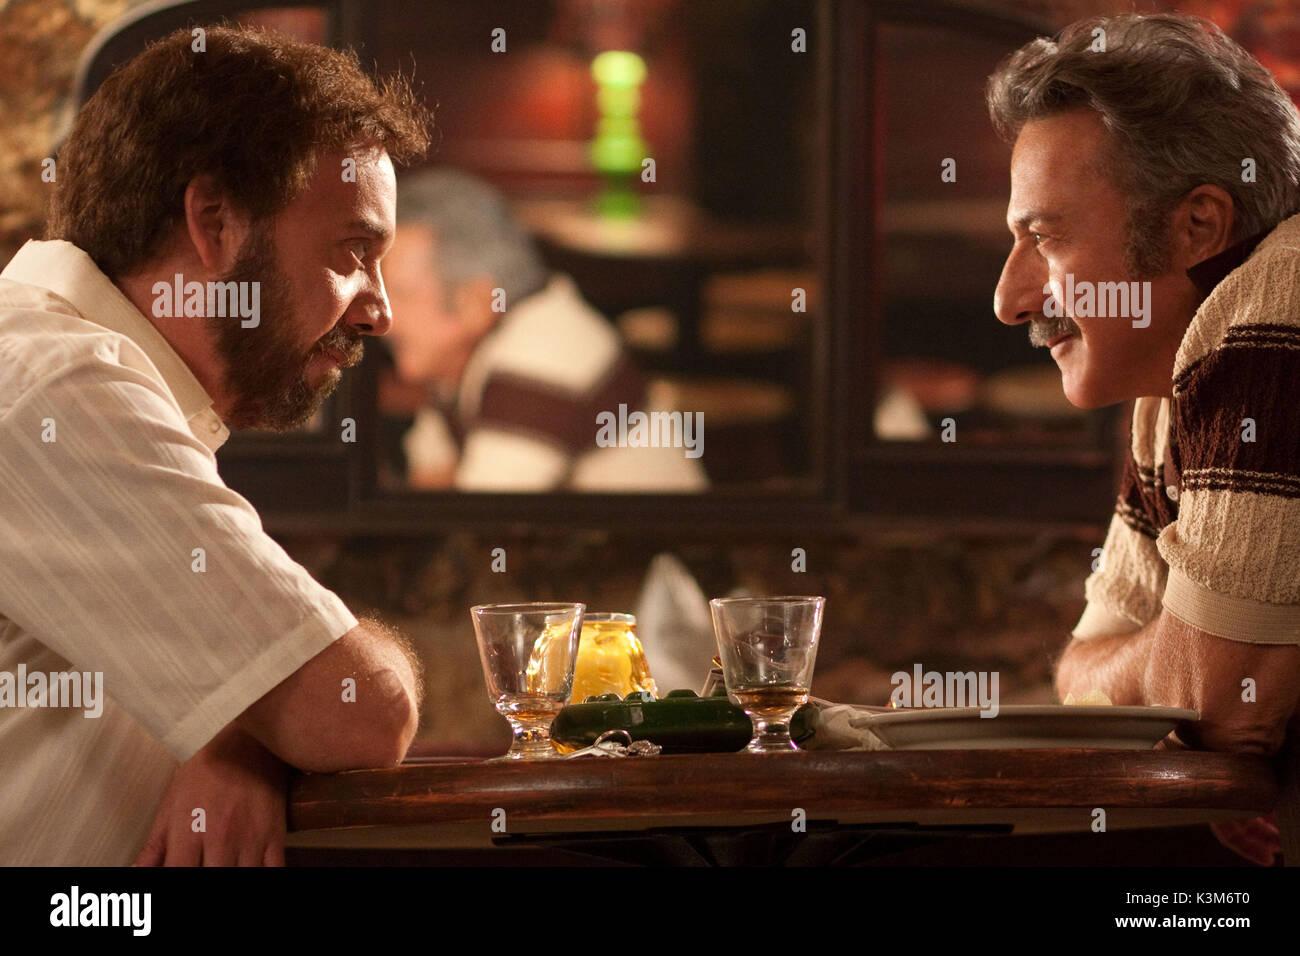 BARNEY'S VERSION [CAN / IT 2010] PAUL GIAMATTI, DUSTIN HOFFMAN BARNEY'S VERSION     Date: 2010 - Stock Image